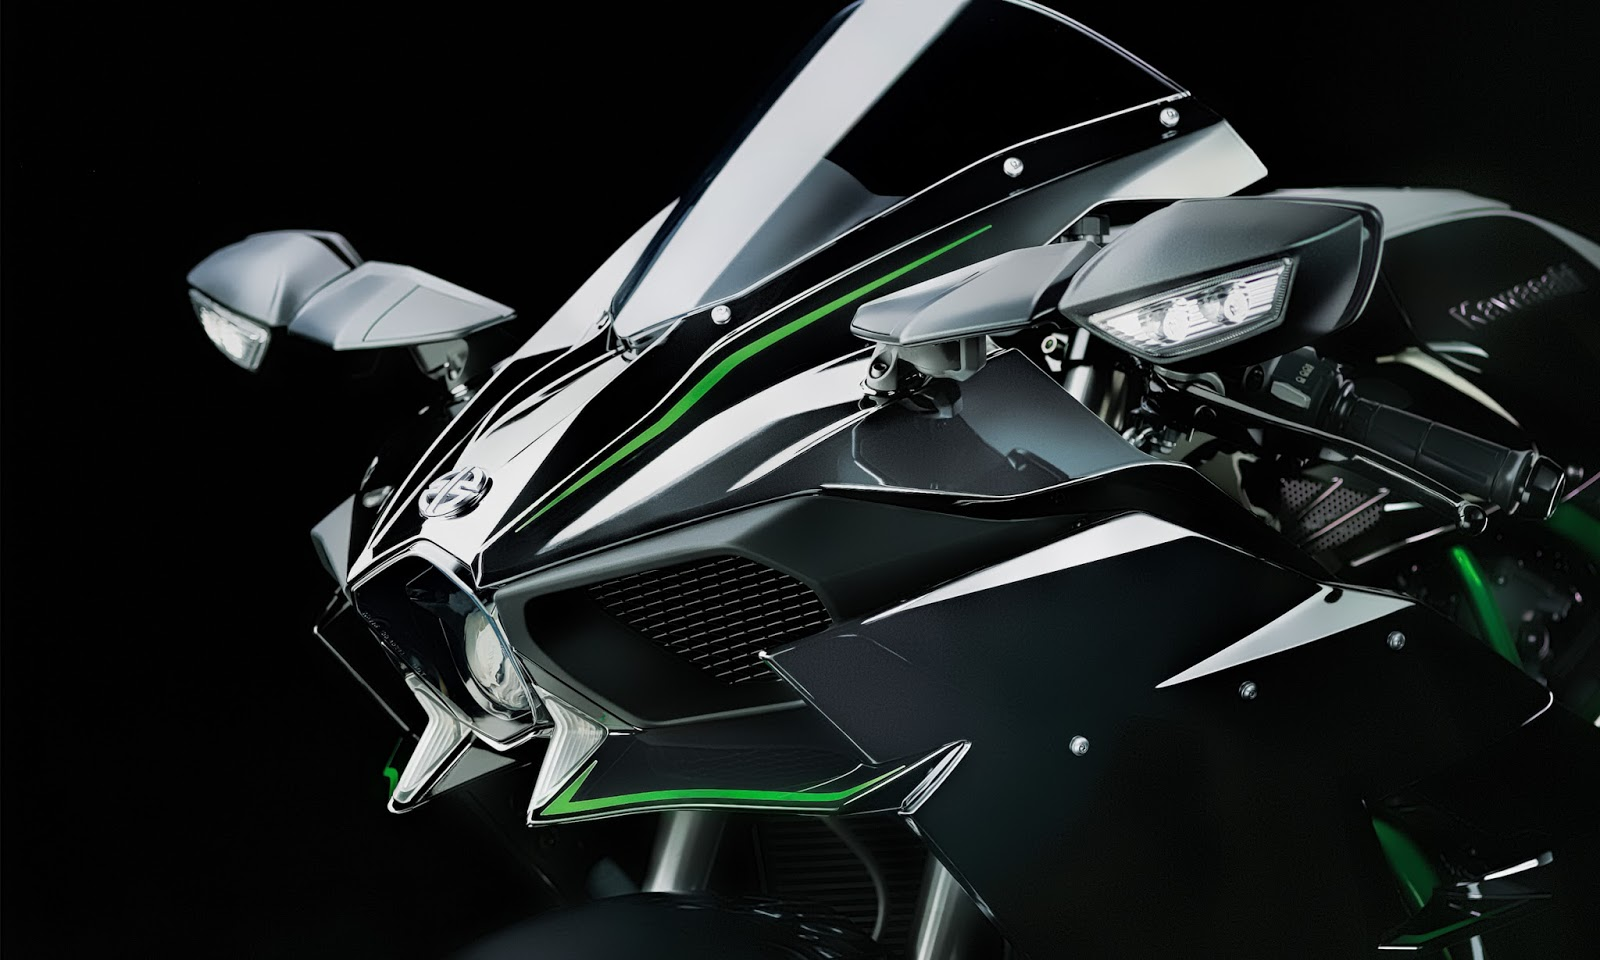 Kawasaki Ninja H2R HD Wallpapers  High Definition Free Background